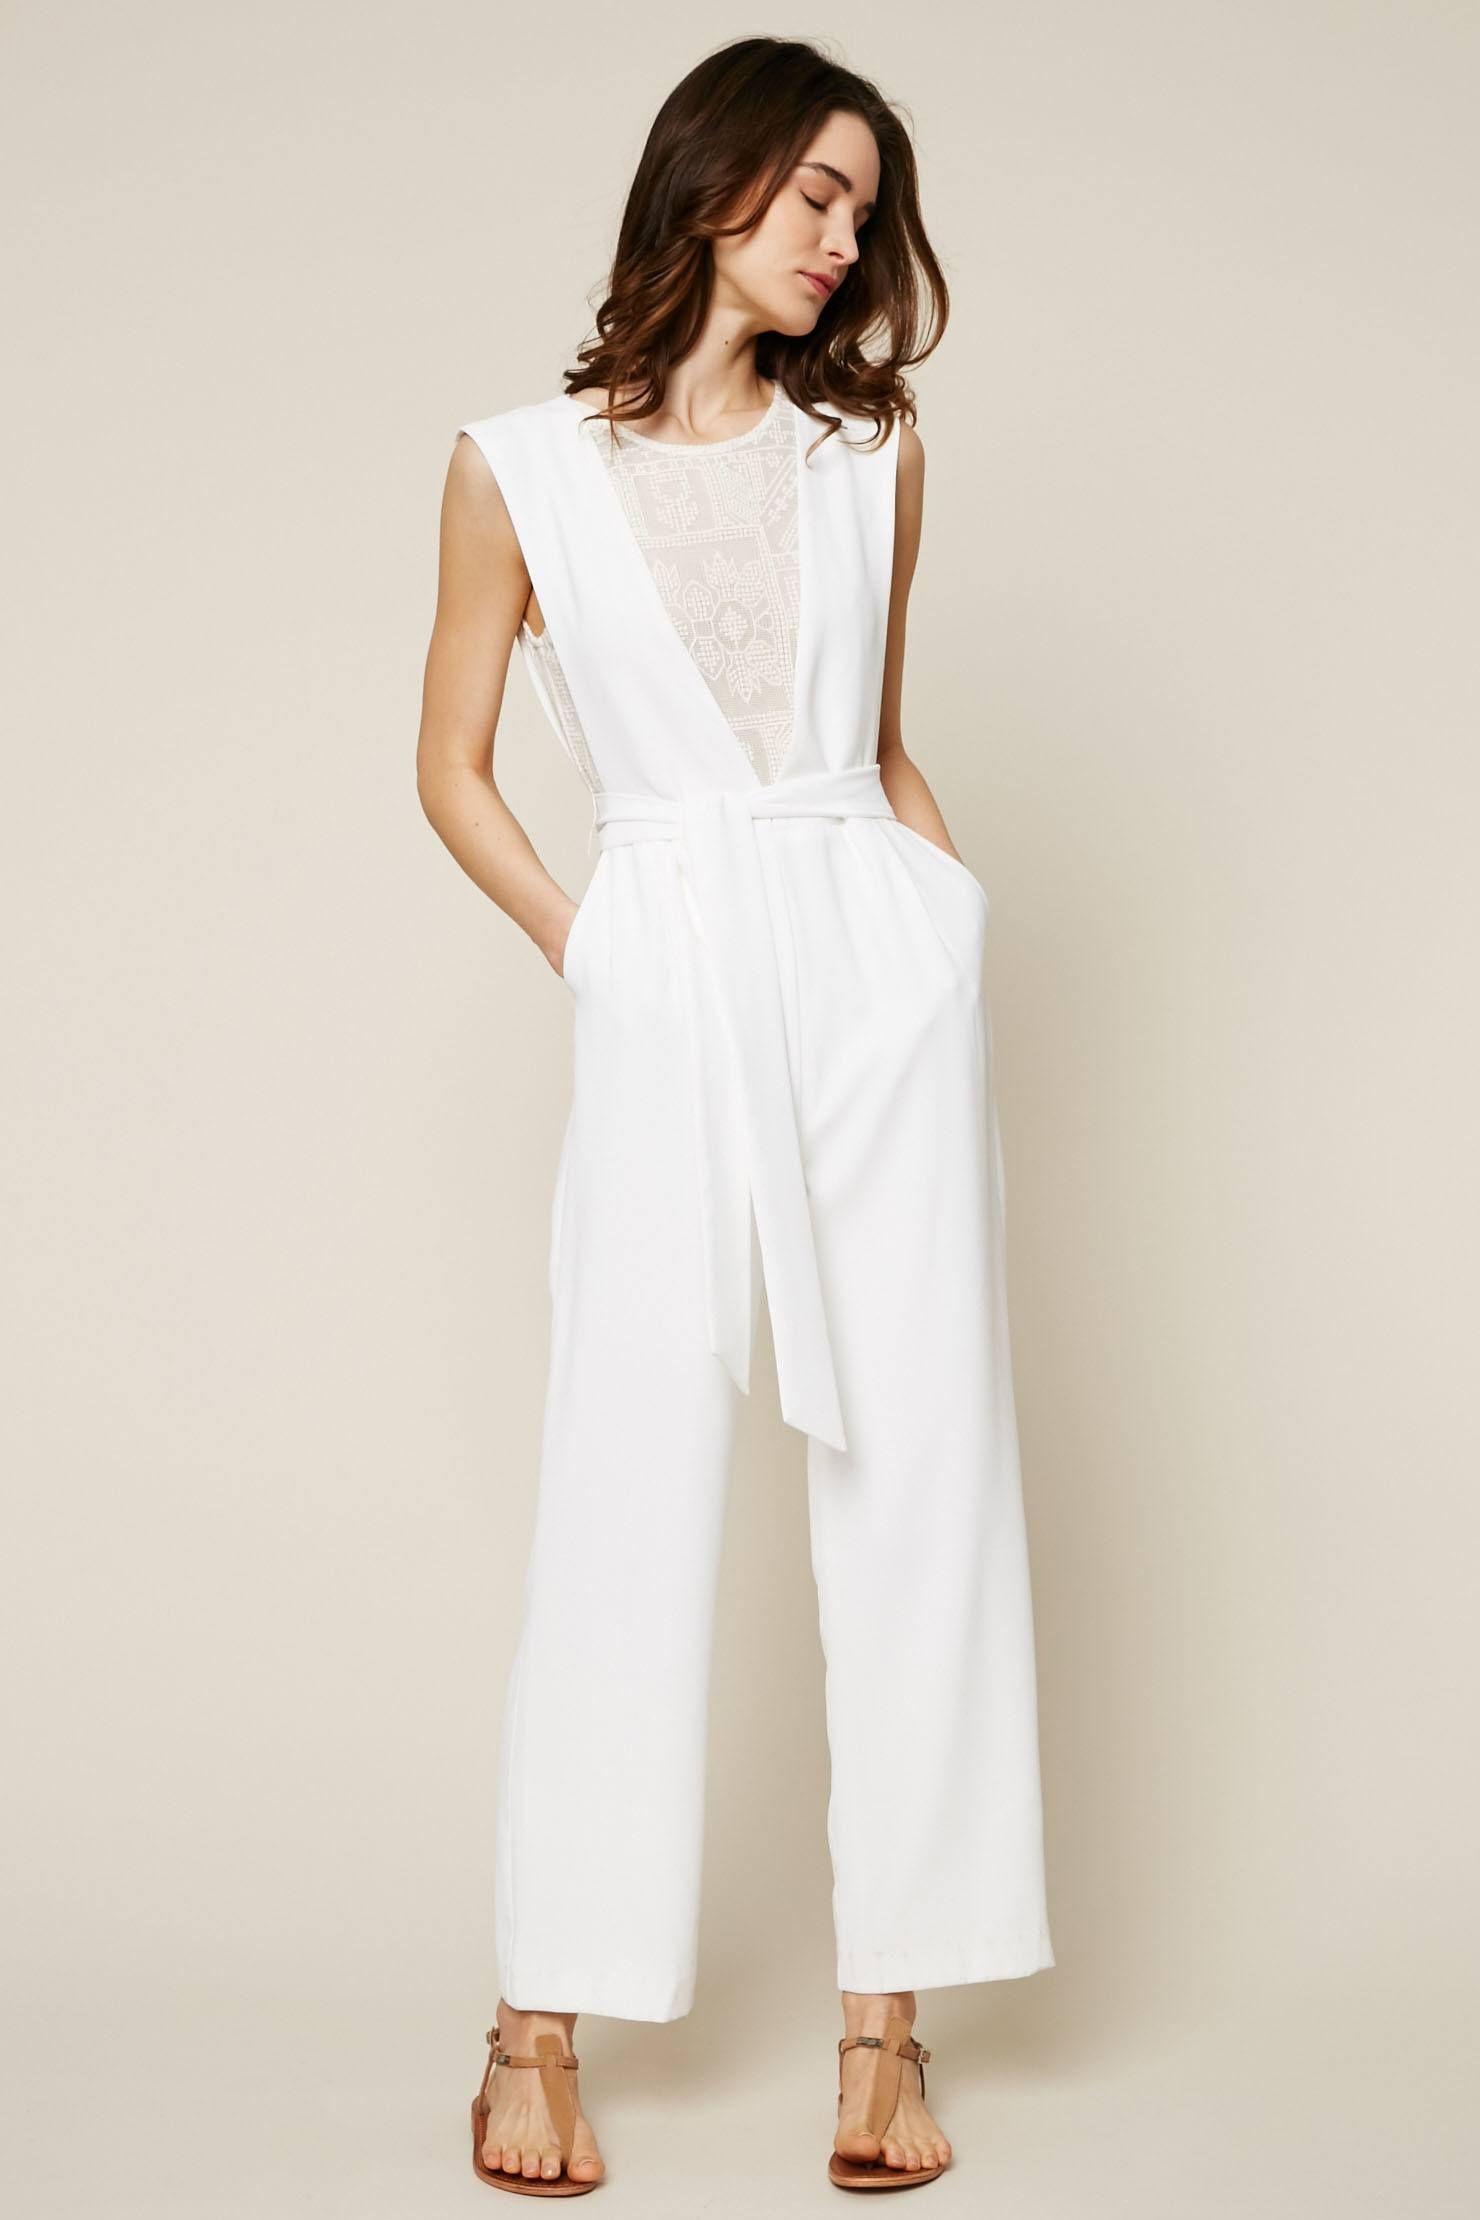 444b9d28e4ee Suncoo Tyler Combi-pantalon avec dentelle macramé blanc cassé ...